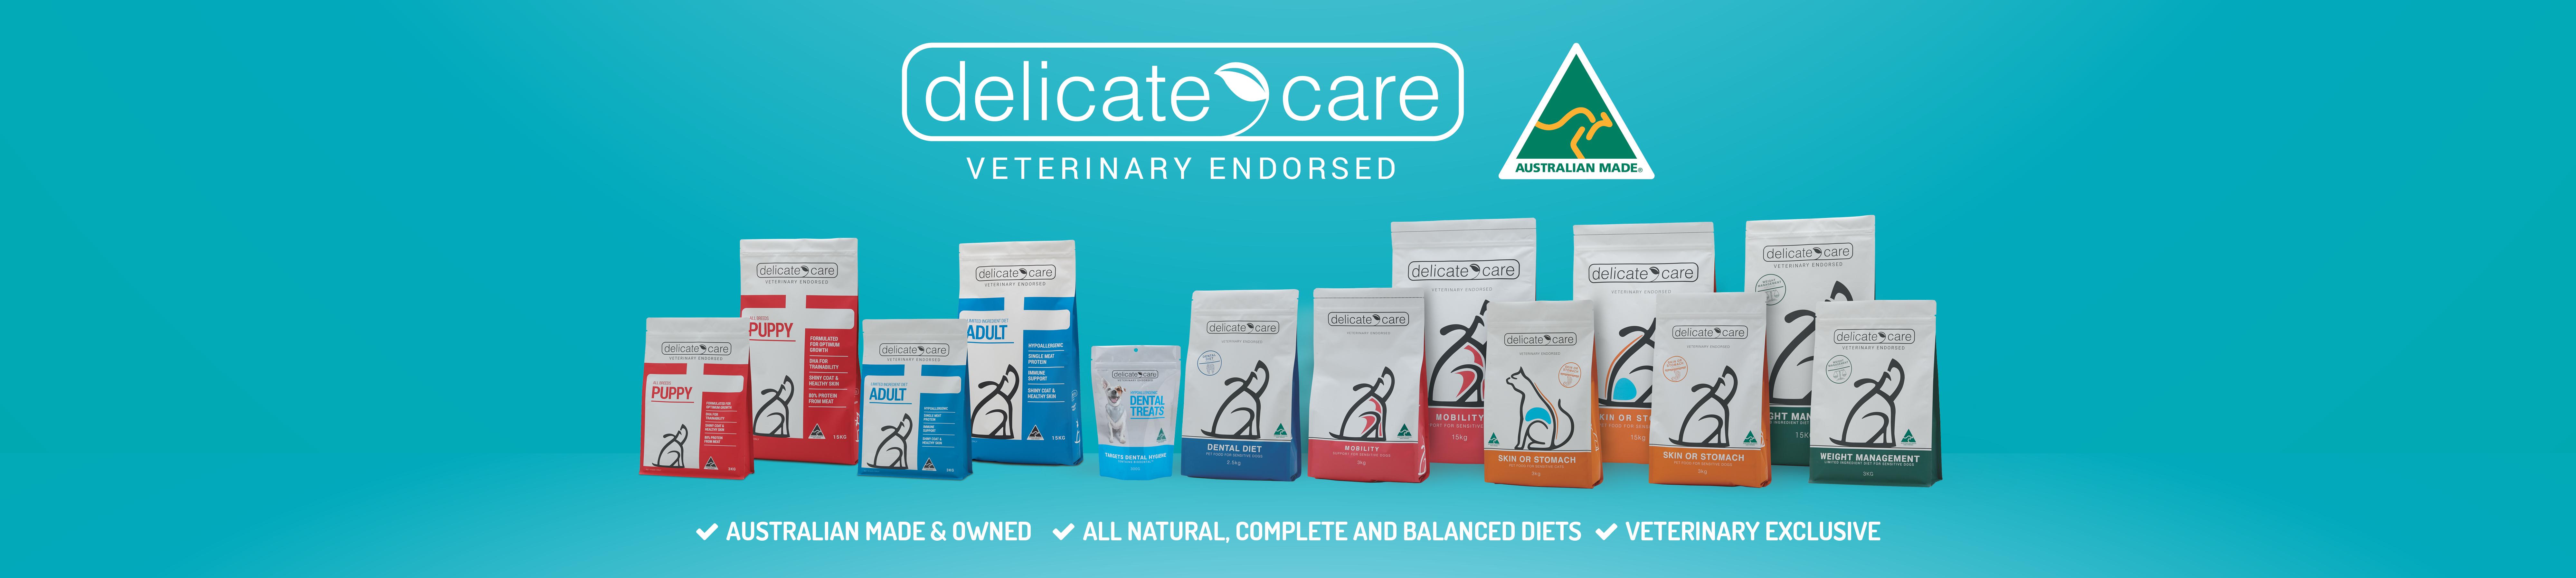 Cenvet Delicate Care Banner